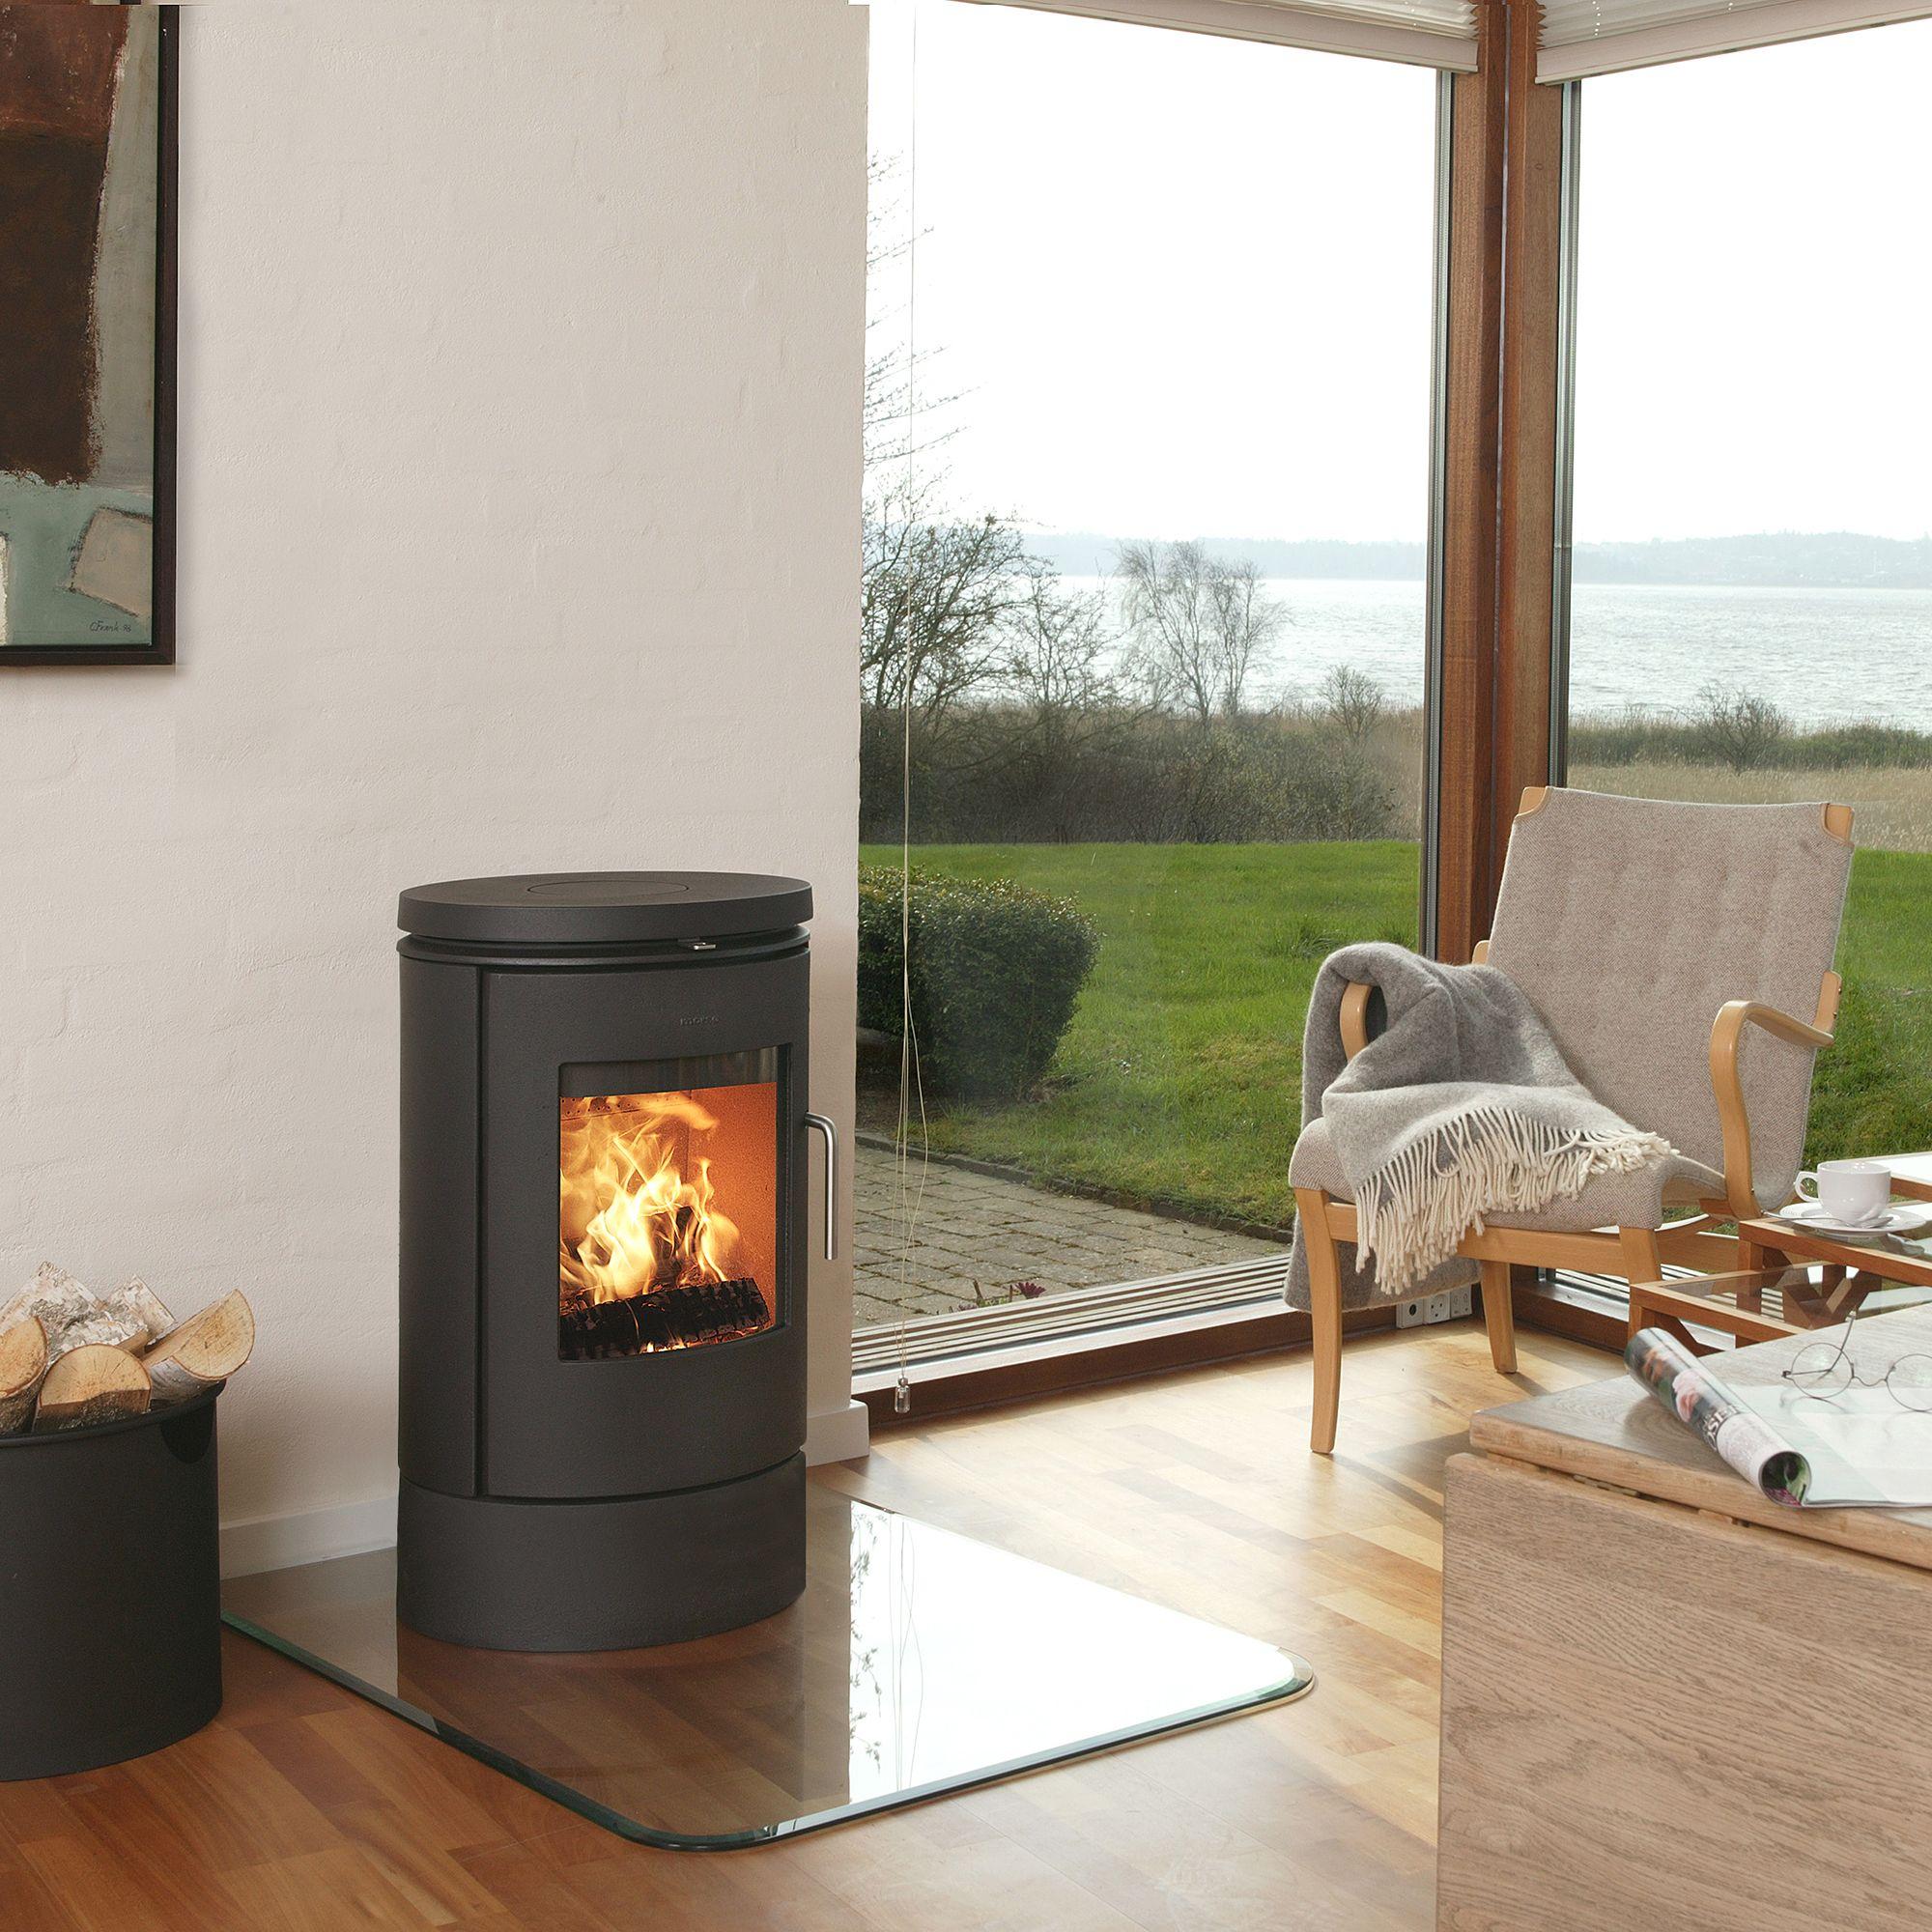 Morsø 6140 Wood Burning Stove øsoliving Wood stove